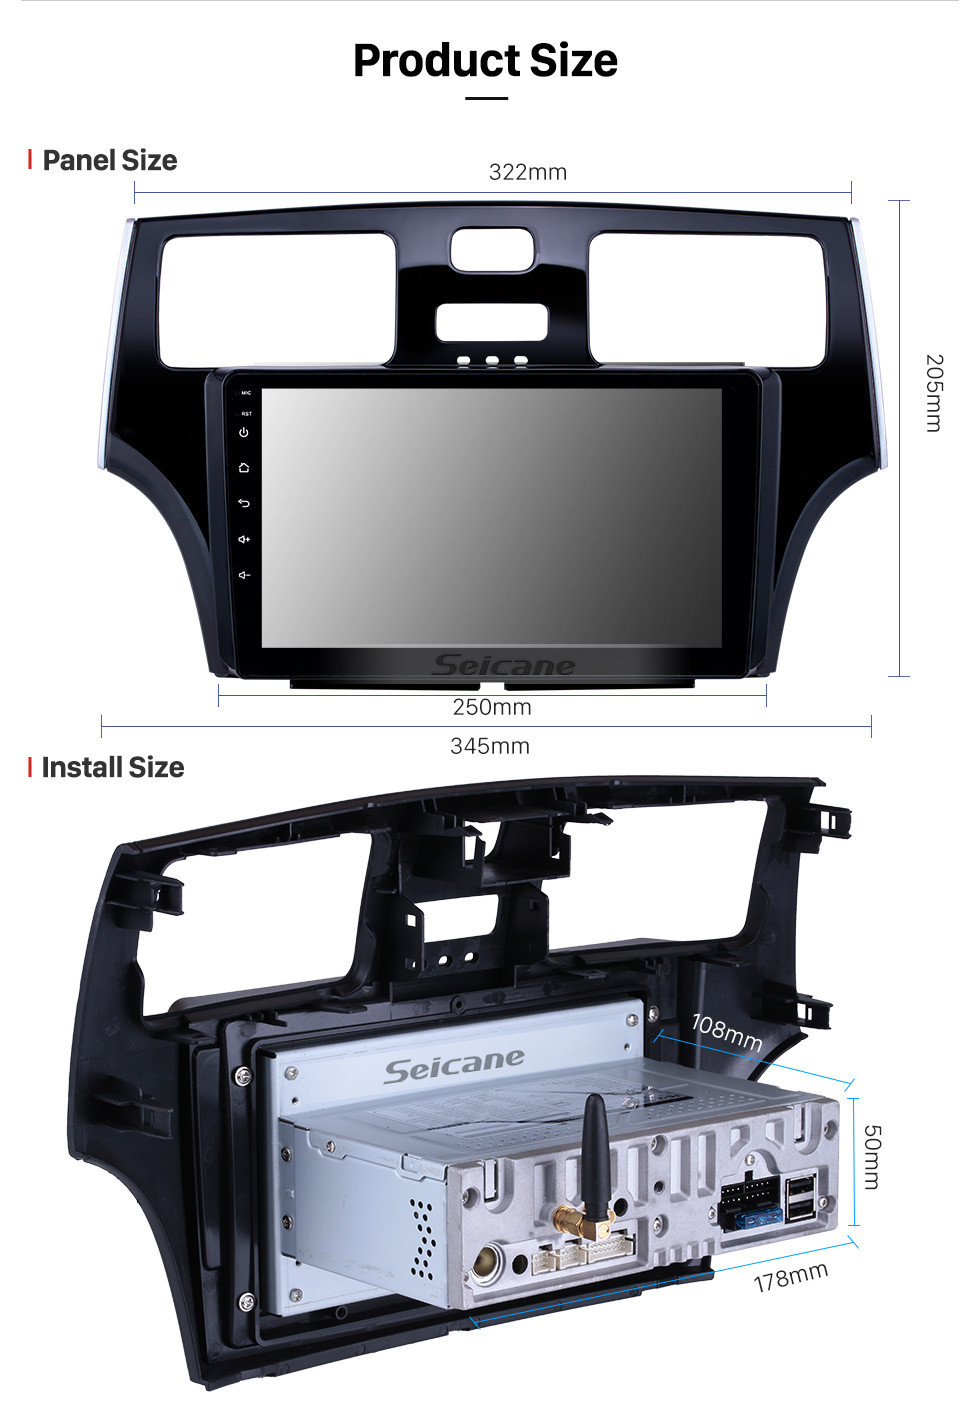 Seicane 2001 2002 2003 2004 2005 Lexus ES300  Android 10.0 HD Touchscreen 9 inch Radio GPS Navigation Bluetooth FM SWC WIFI USB Carplay Backup Camera